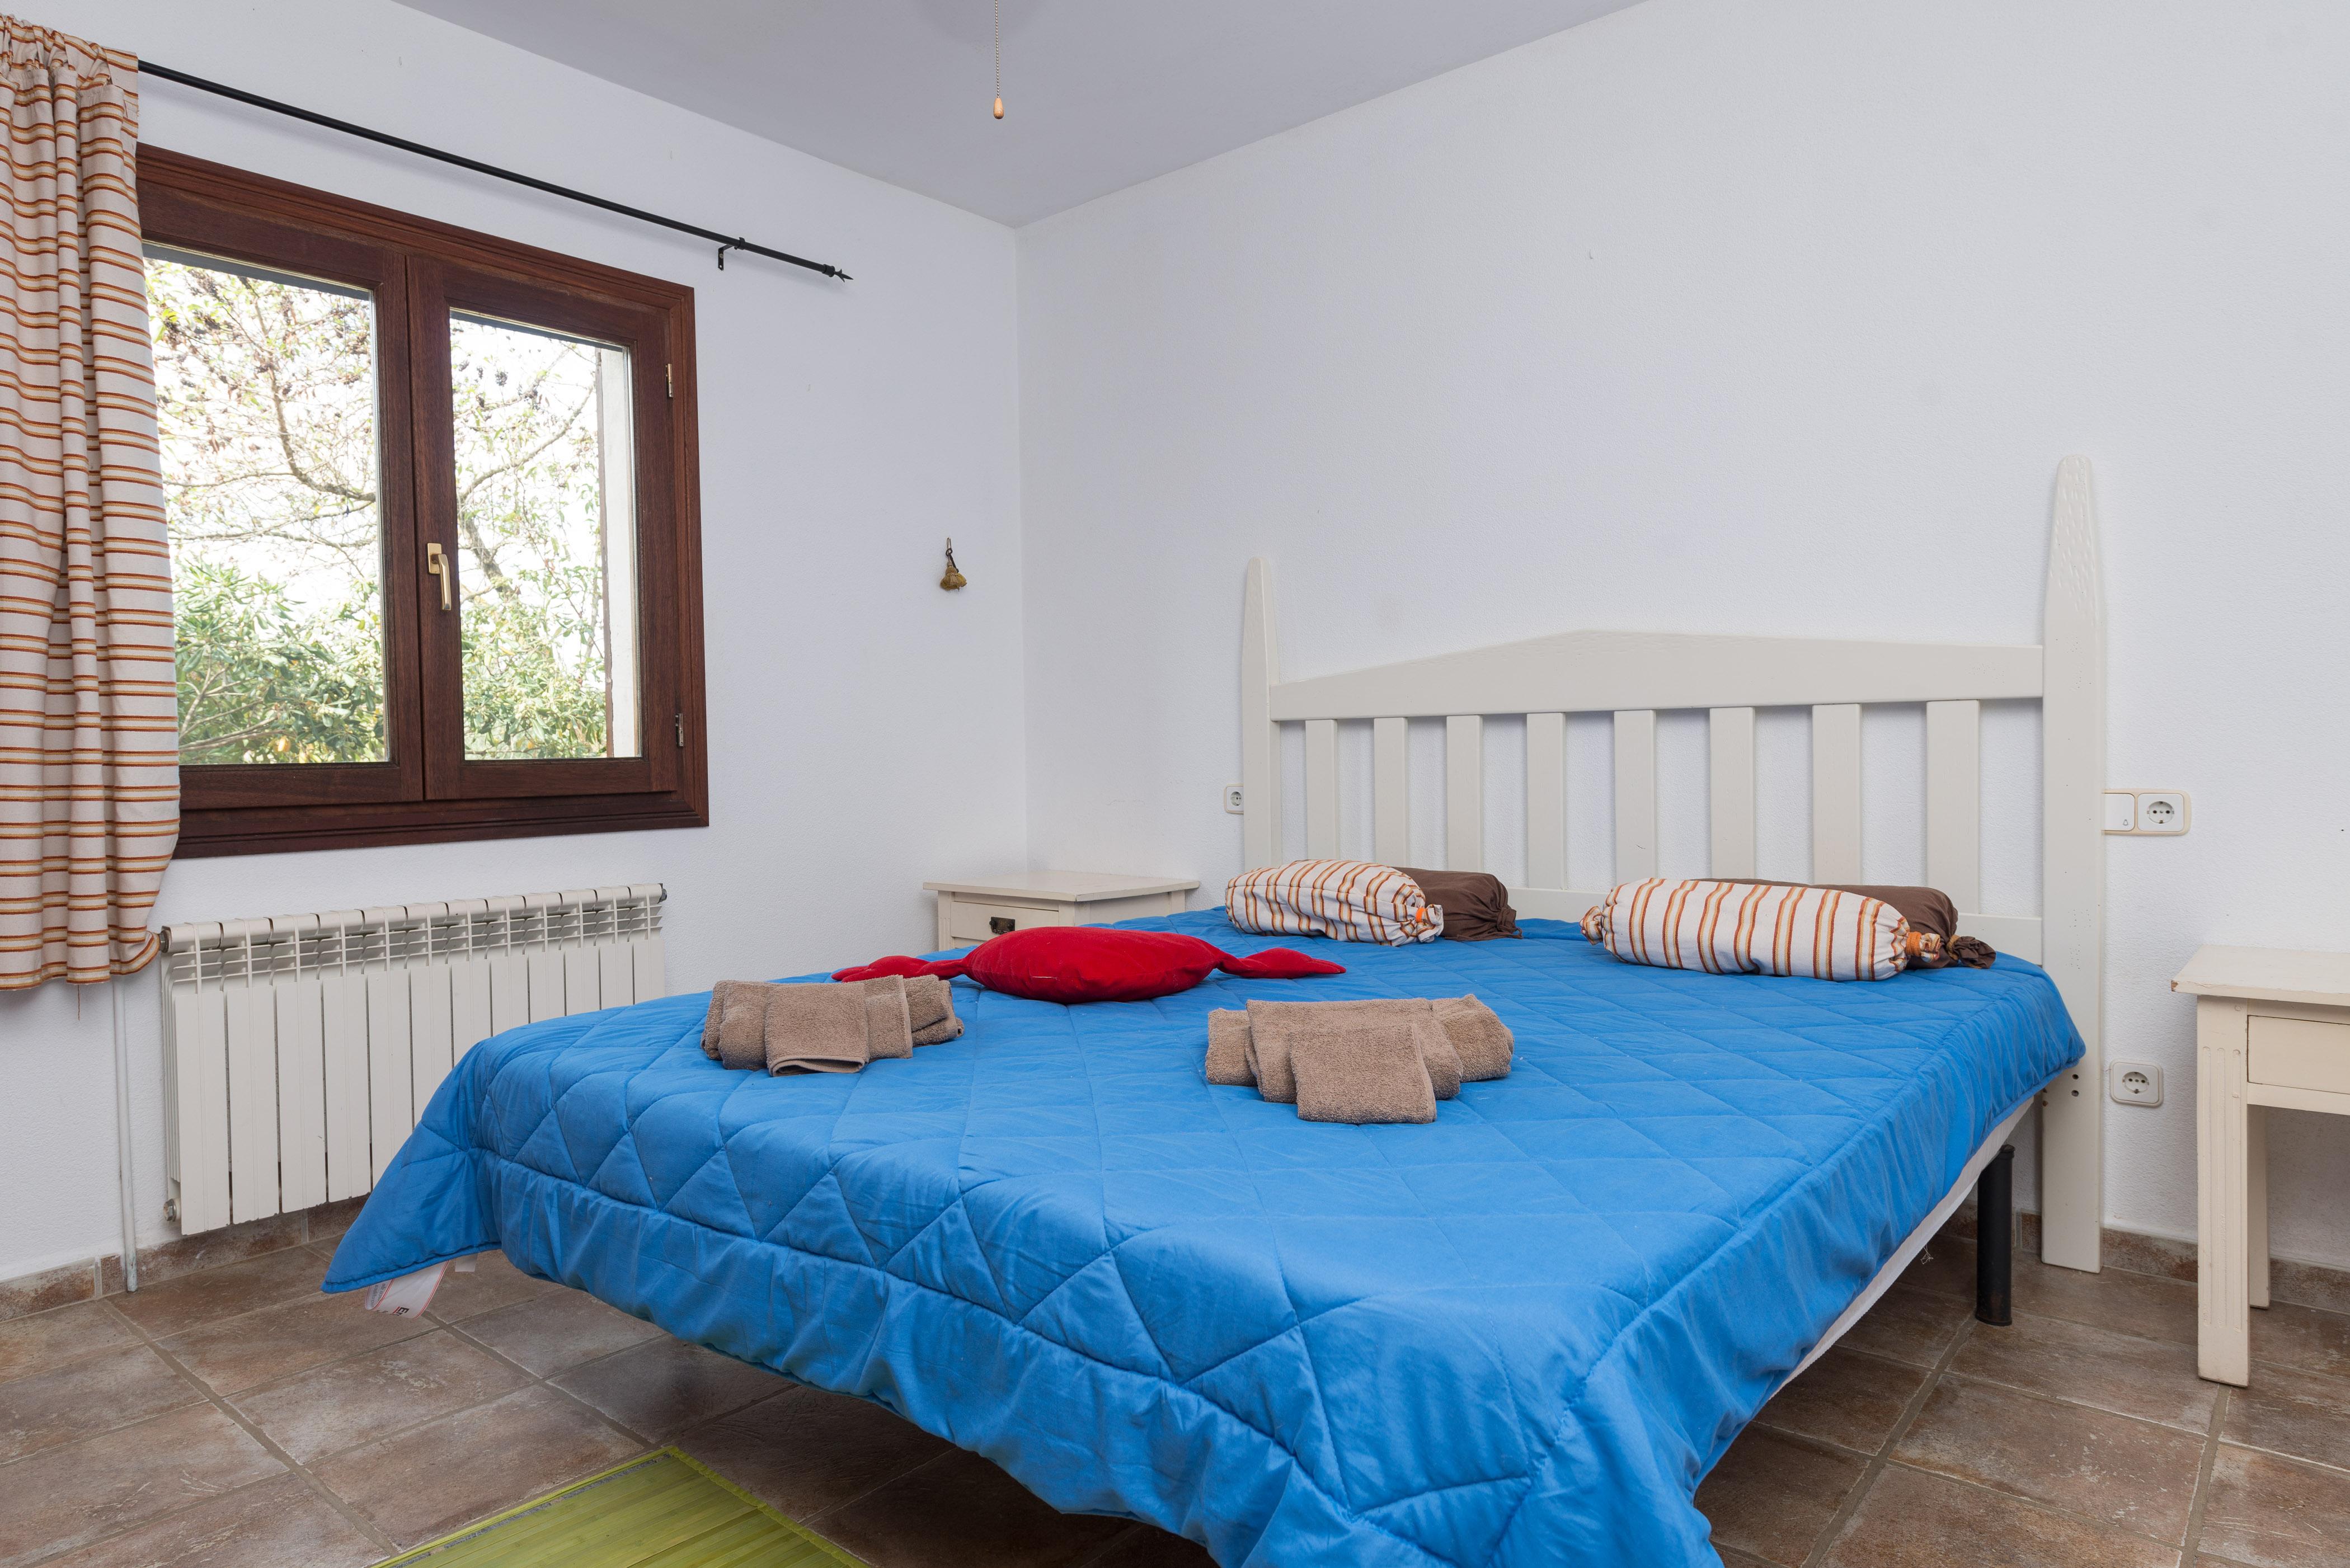 Ferienhaus SA CORBAIA (2020559), Arta, Mallorca, Balearische Inseln, Spanien, Bild 23